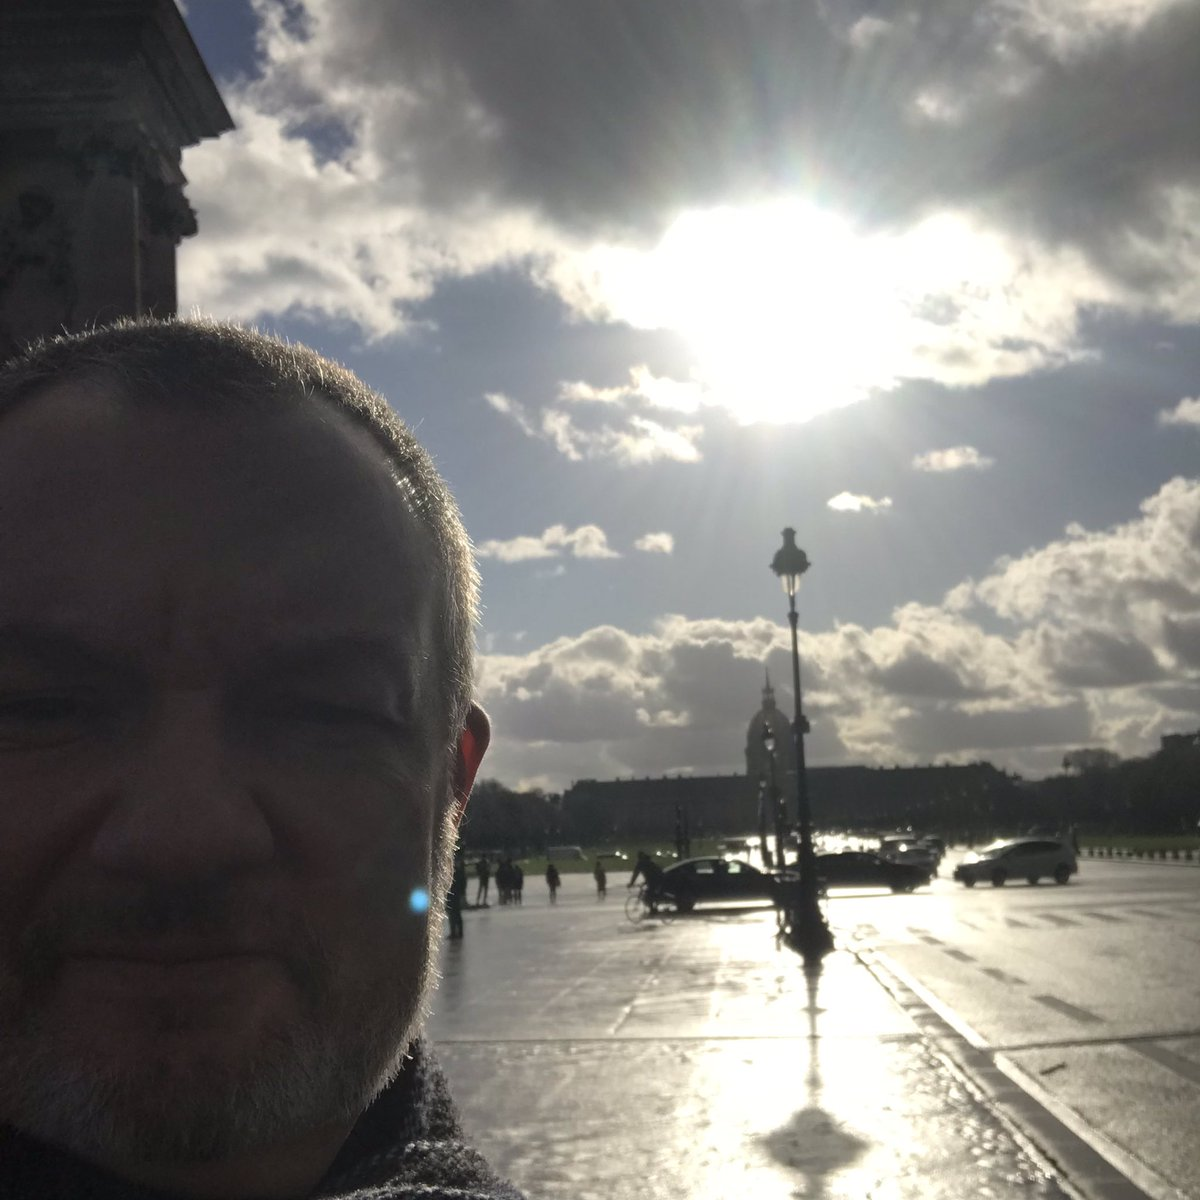 Sunshine!! Lifts the spirits like nothing else! #paris #soleil #bonheur